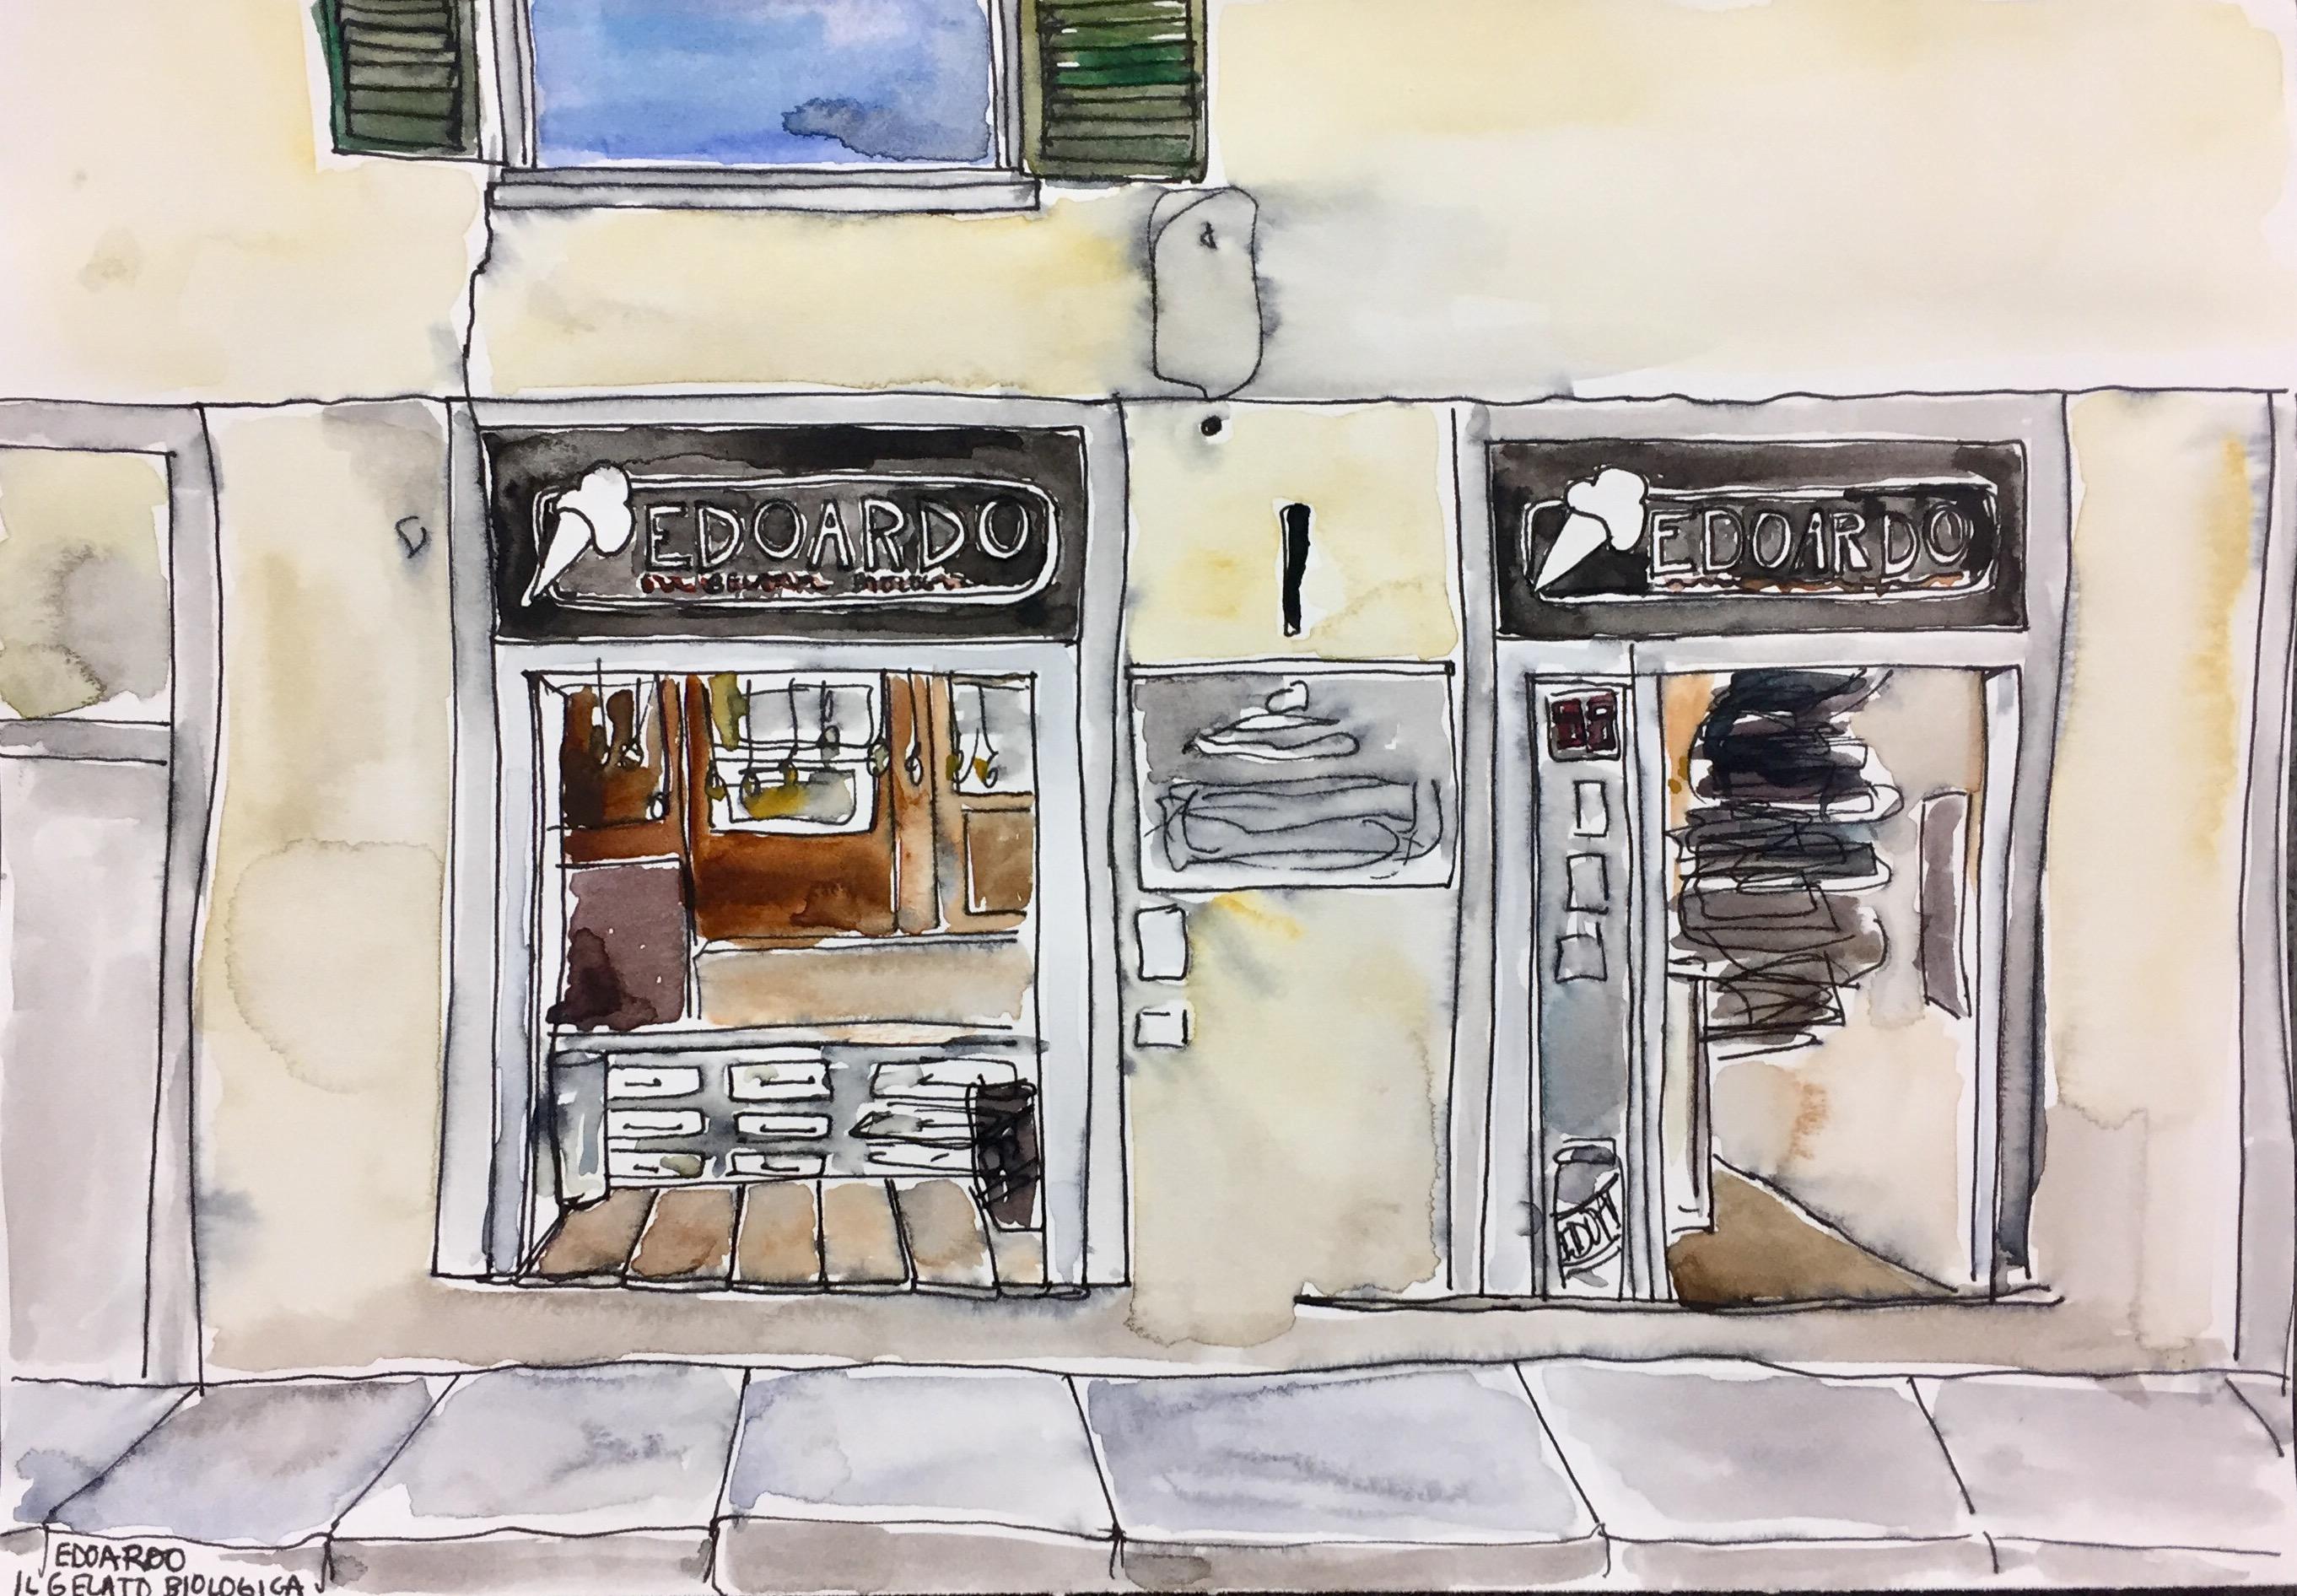 Edoardo's, Florence, IT